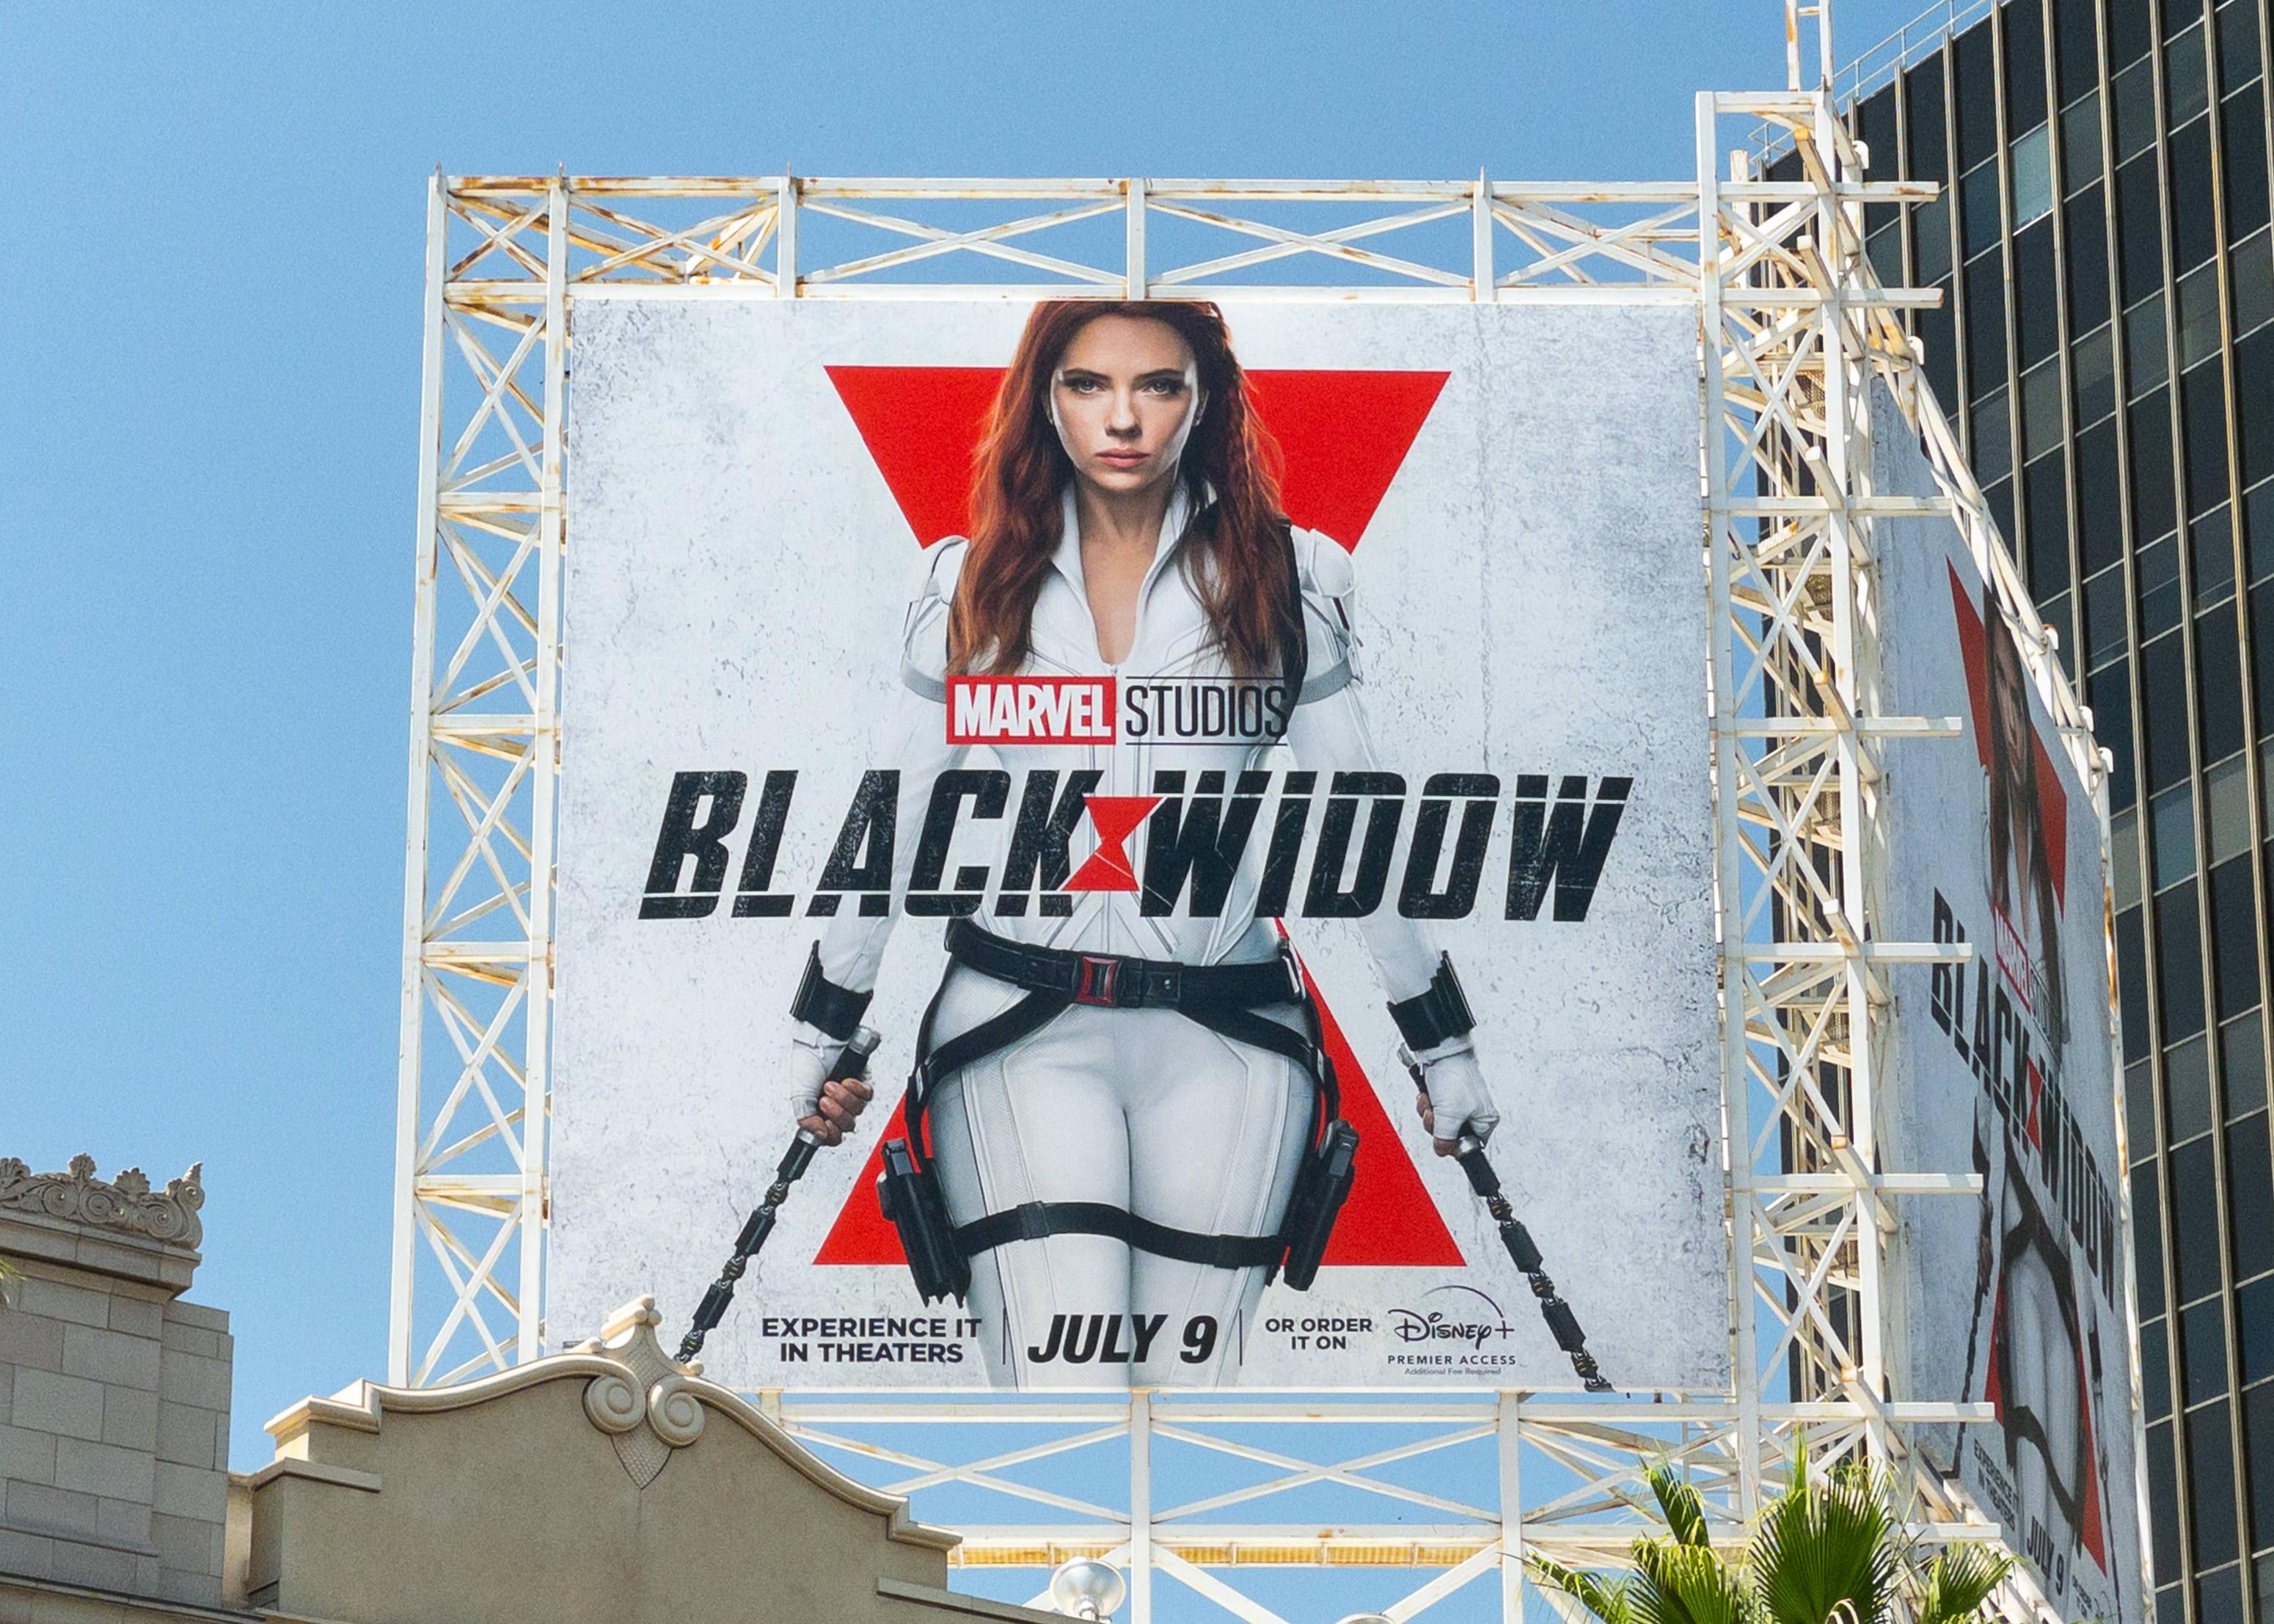 Disney blasts Scarlett Johansson over Black Widow streaming lawsuit